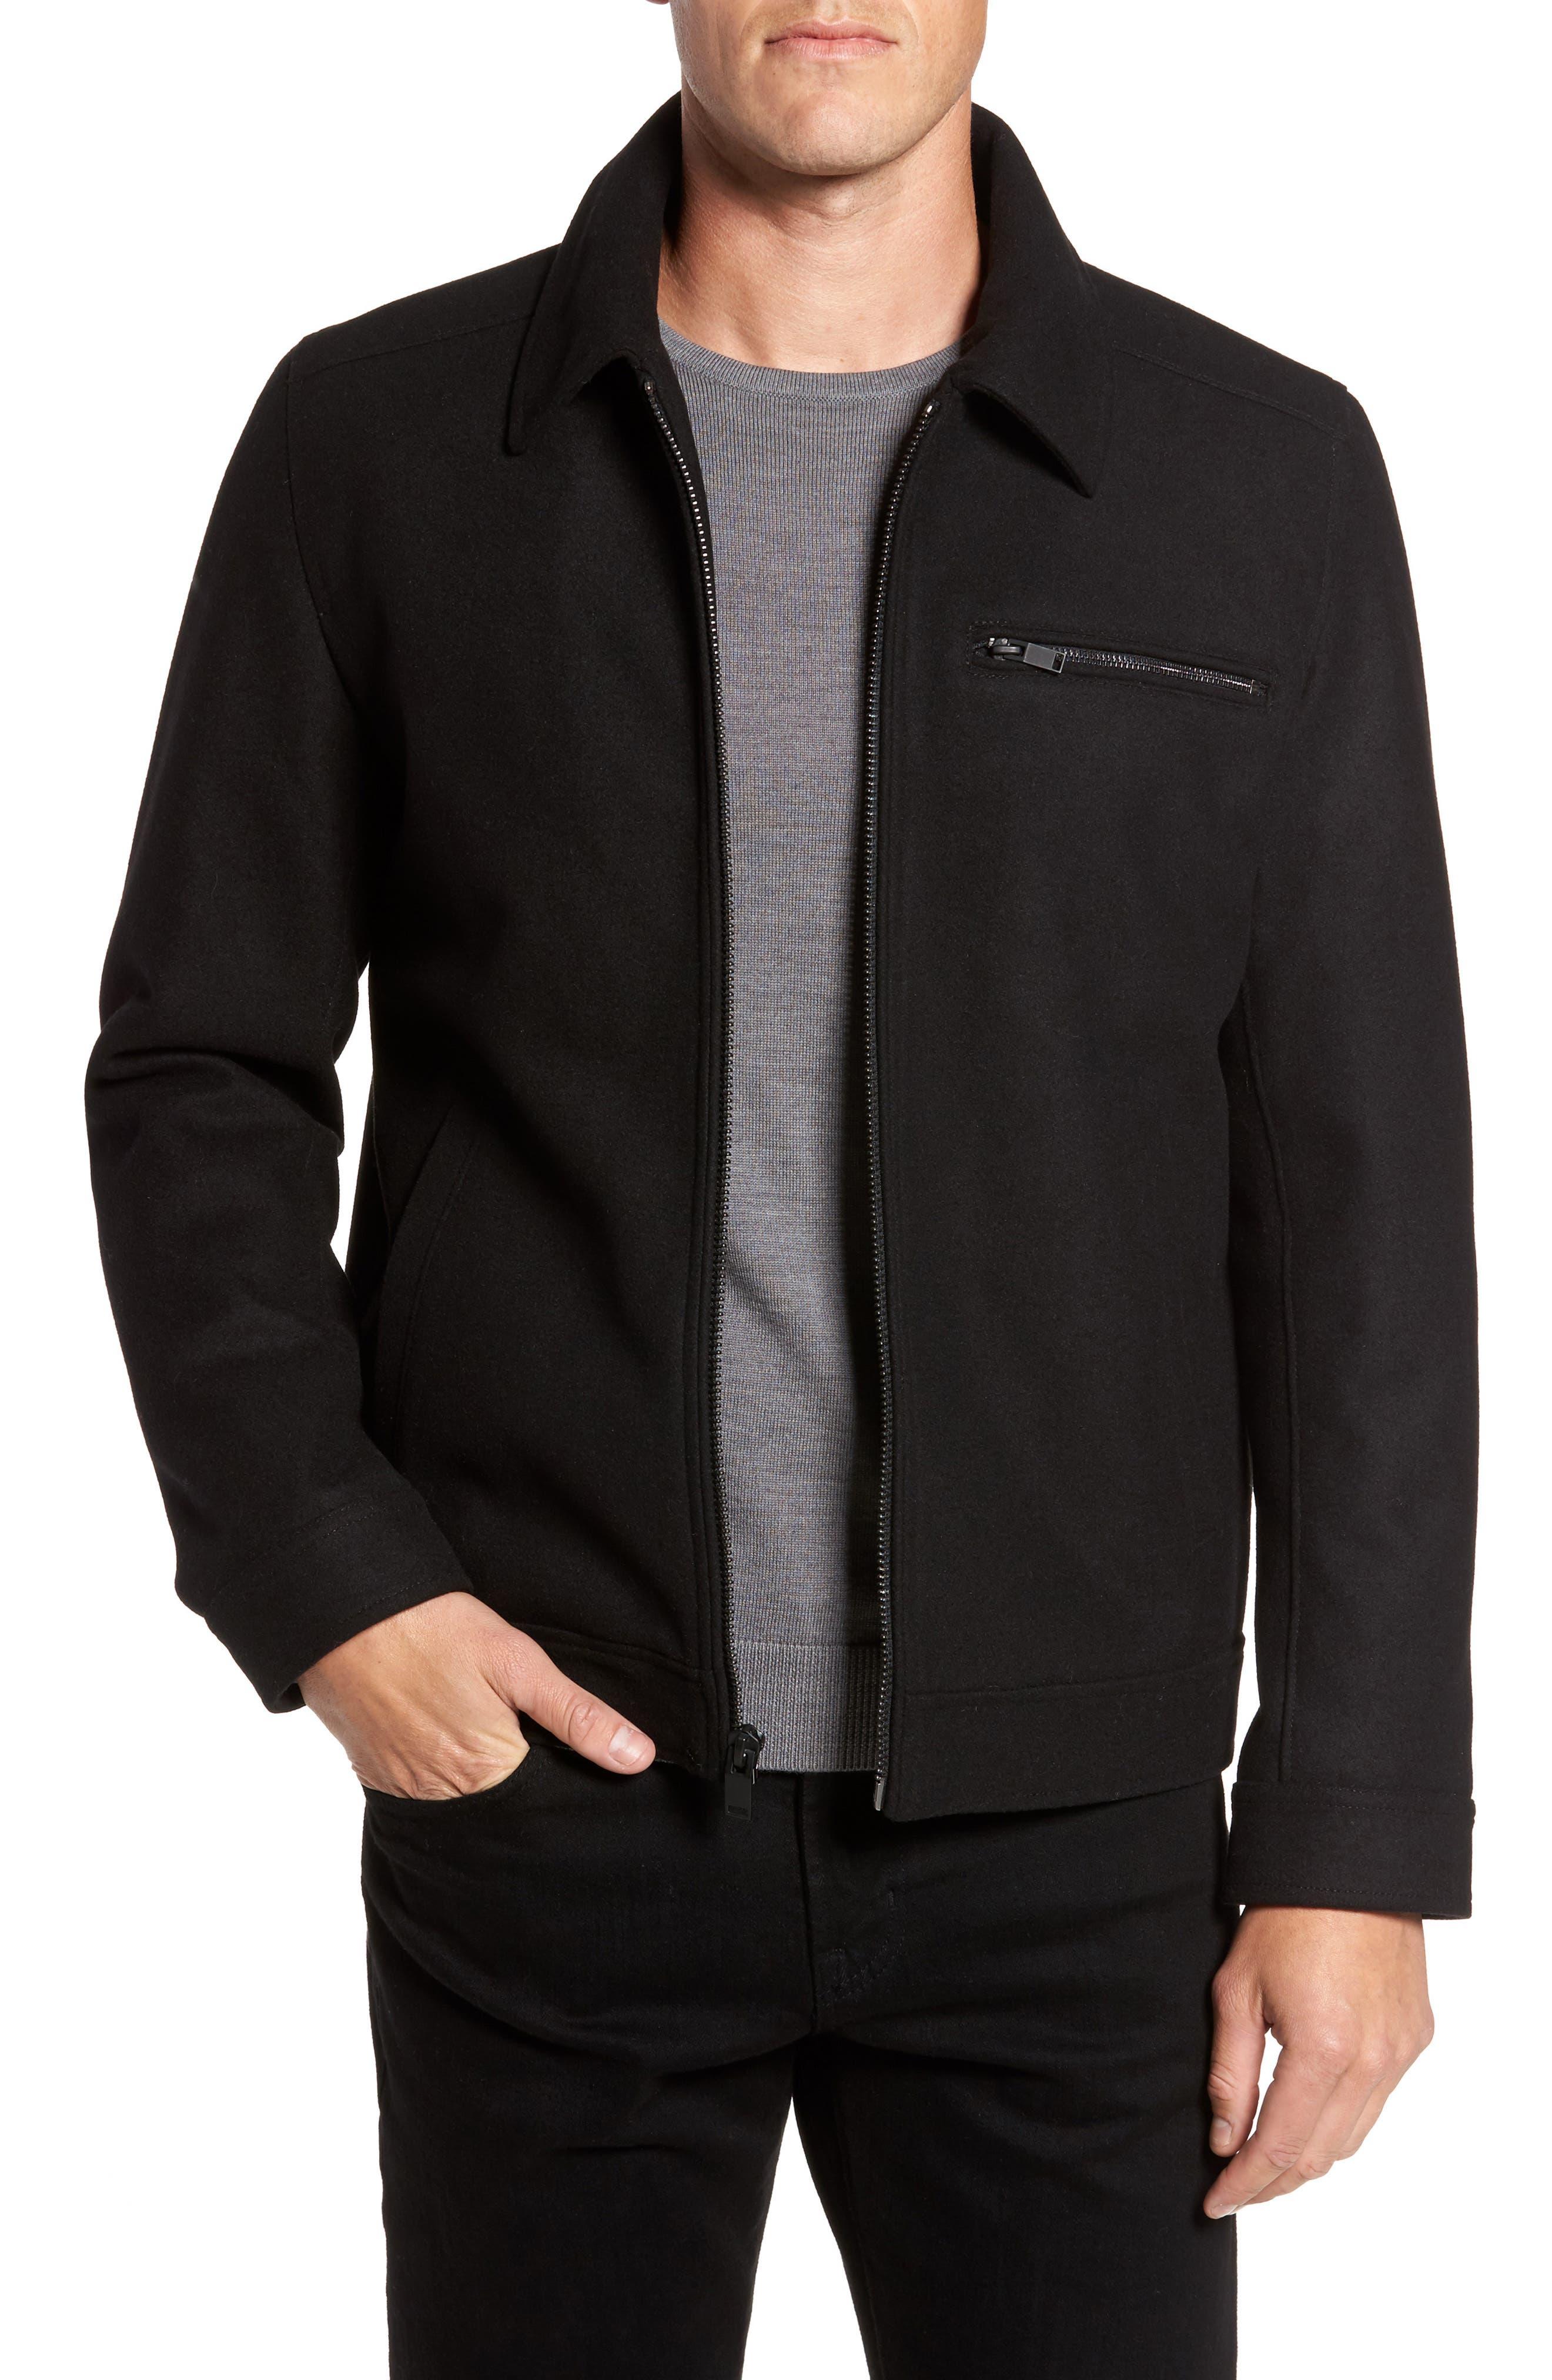 Vince Camuto Wool Blend Shirt Jacket